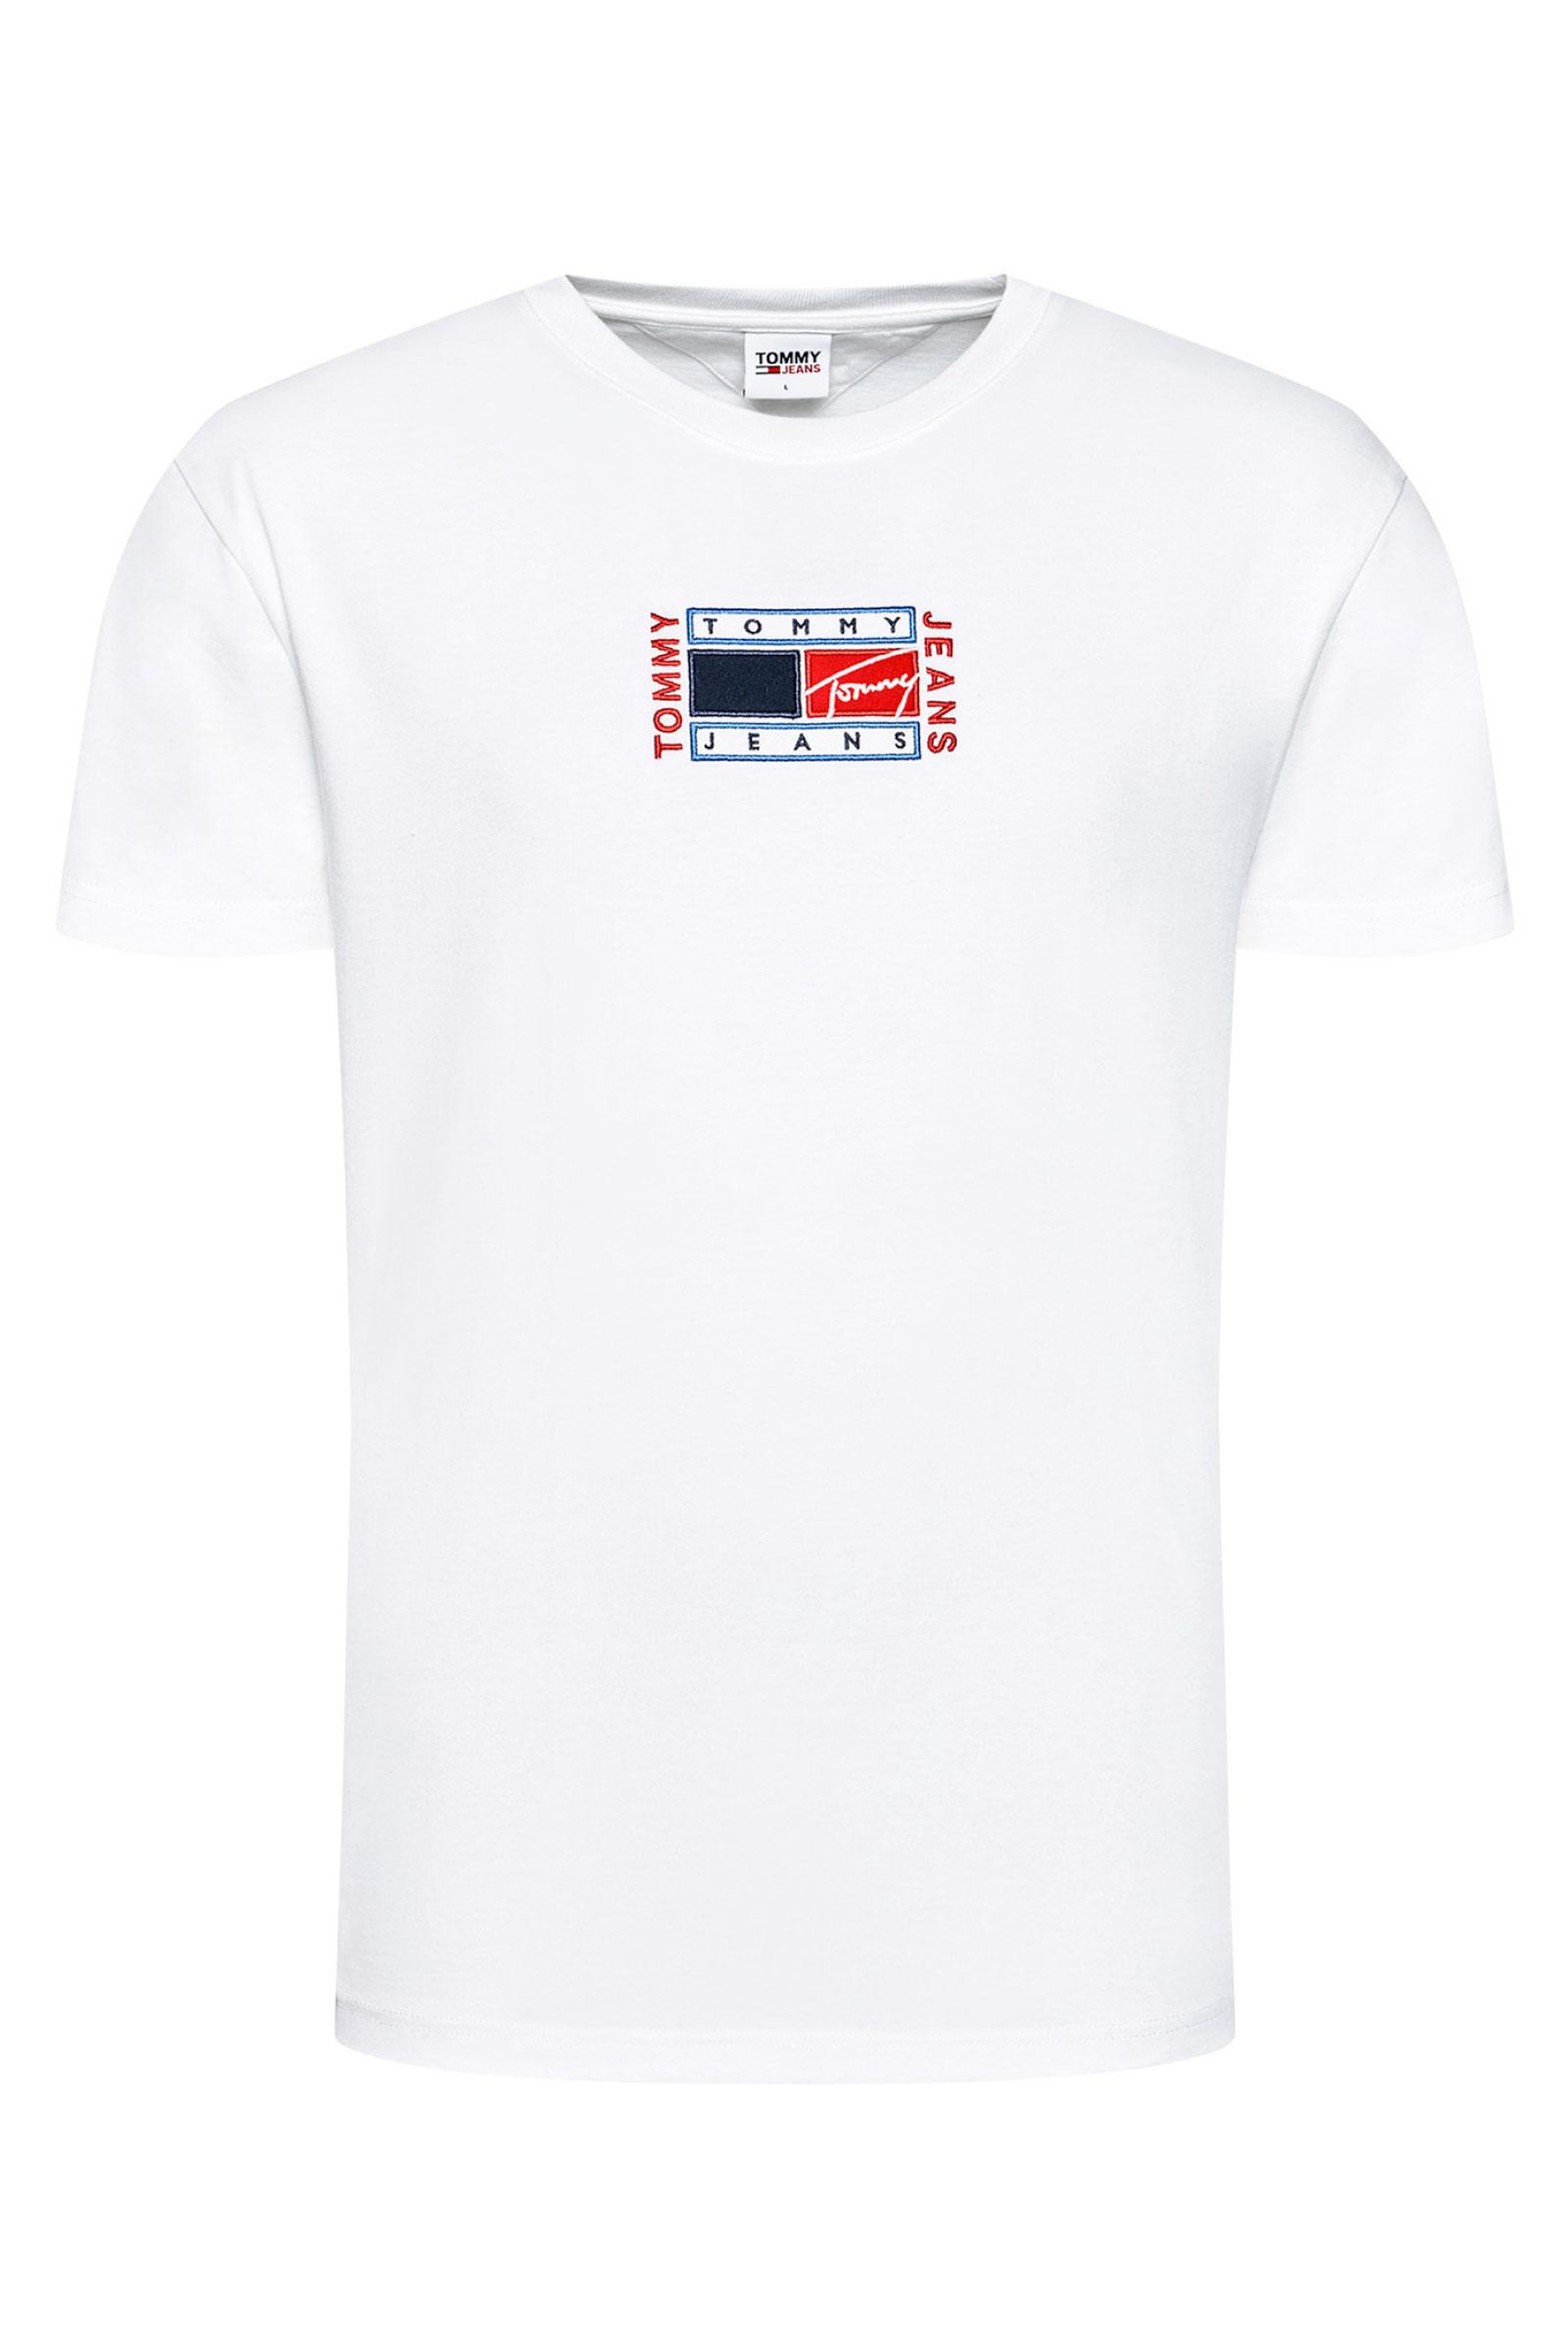 TOMMY JEANS T-Shirt Uomo TOMMY JEANS | T-Shirt | DM0DM10621YBR